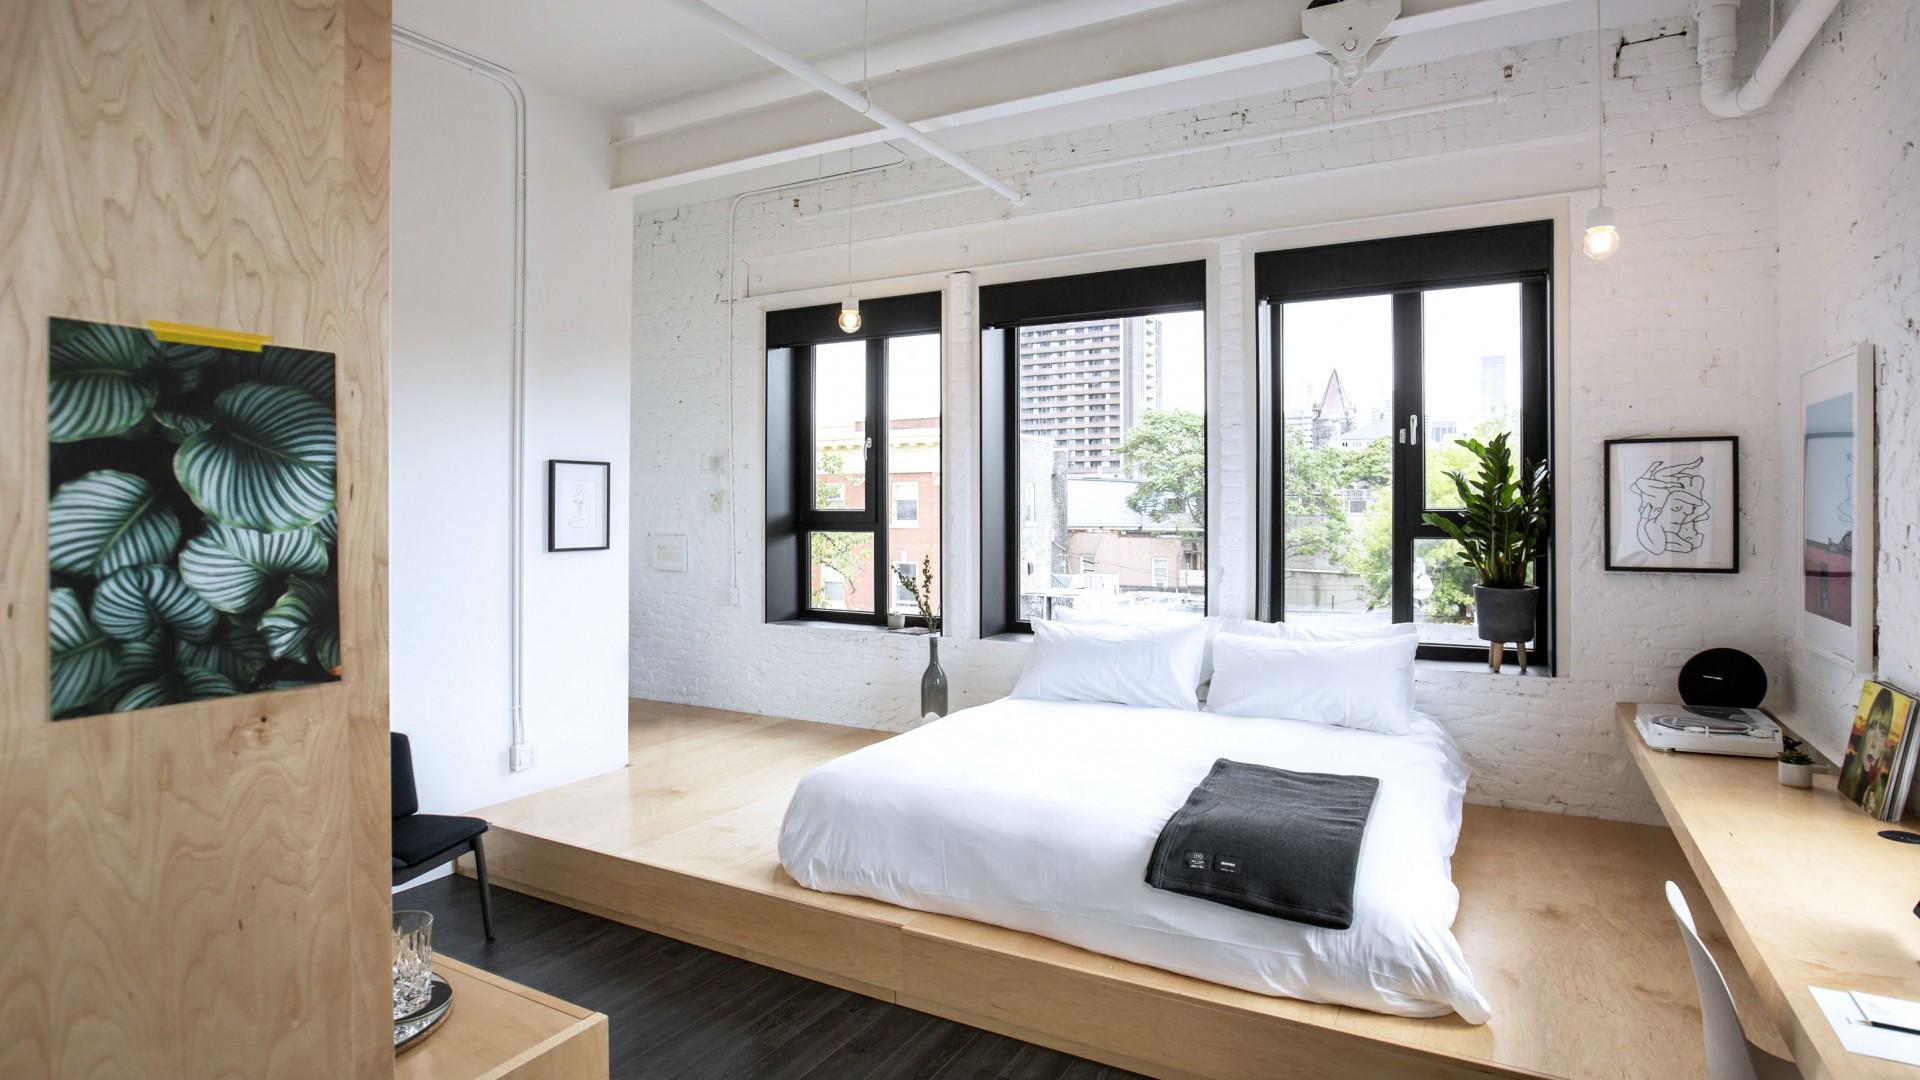 Best hotels Toronto staycation | The Annex Hotel bed on raised platform